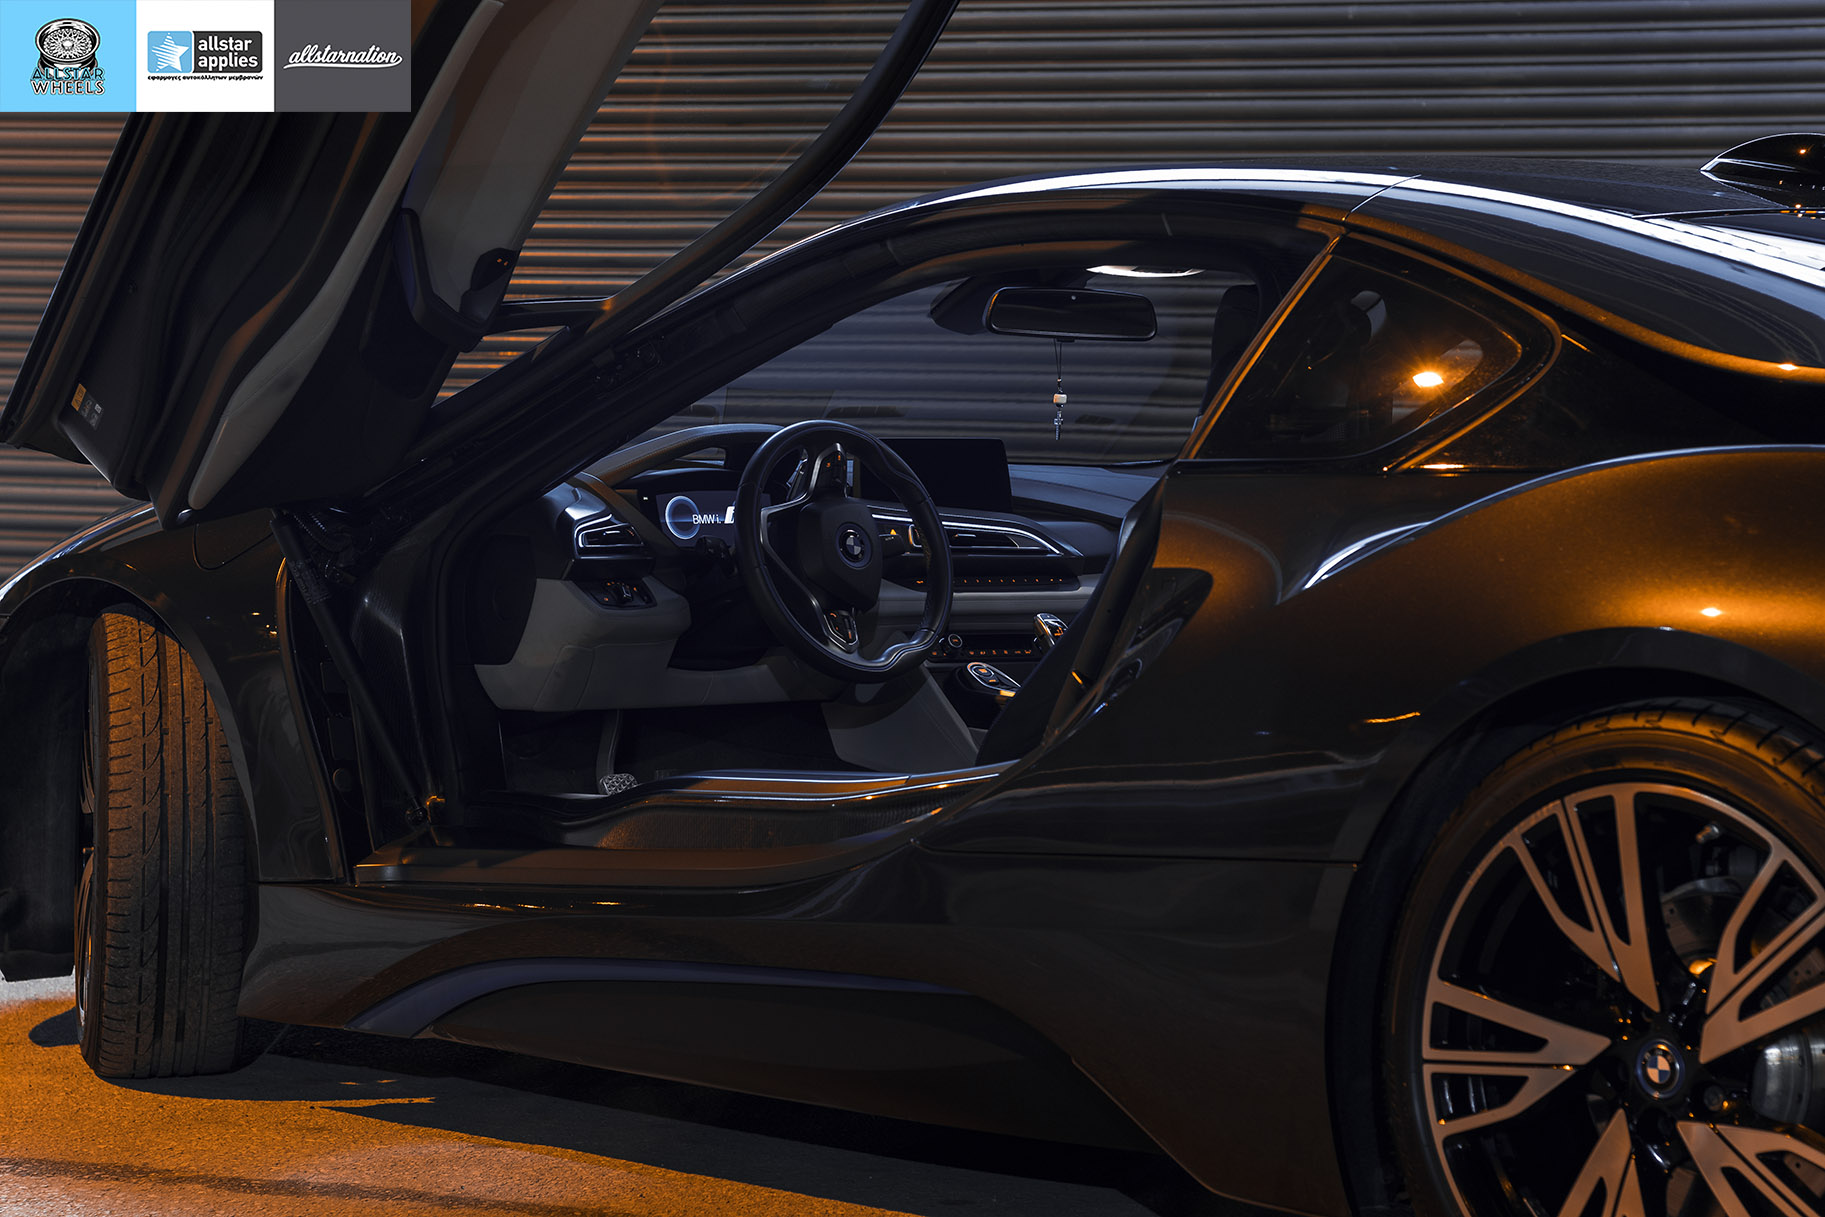 BMW I8 – Μεμβράνες προστασίας χρώματος – Μπροστινό πακέτο (5)